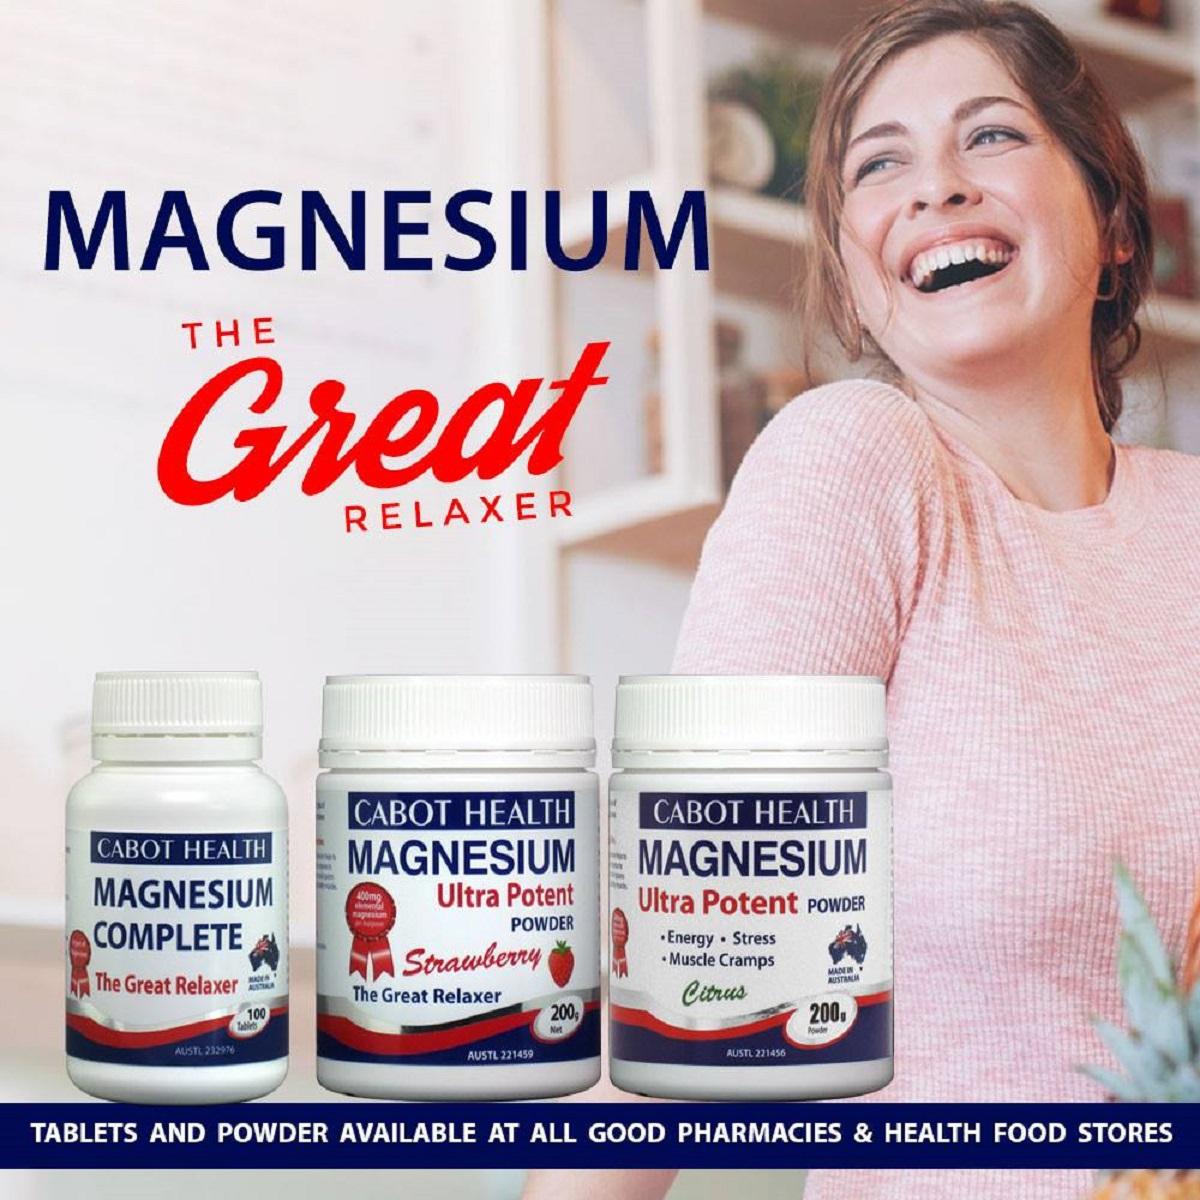 Cabot Health Magnesium Complete